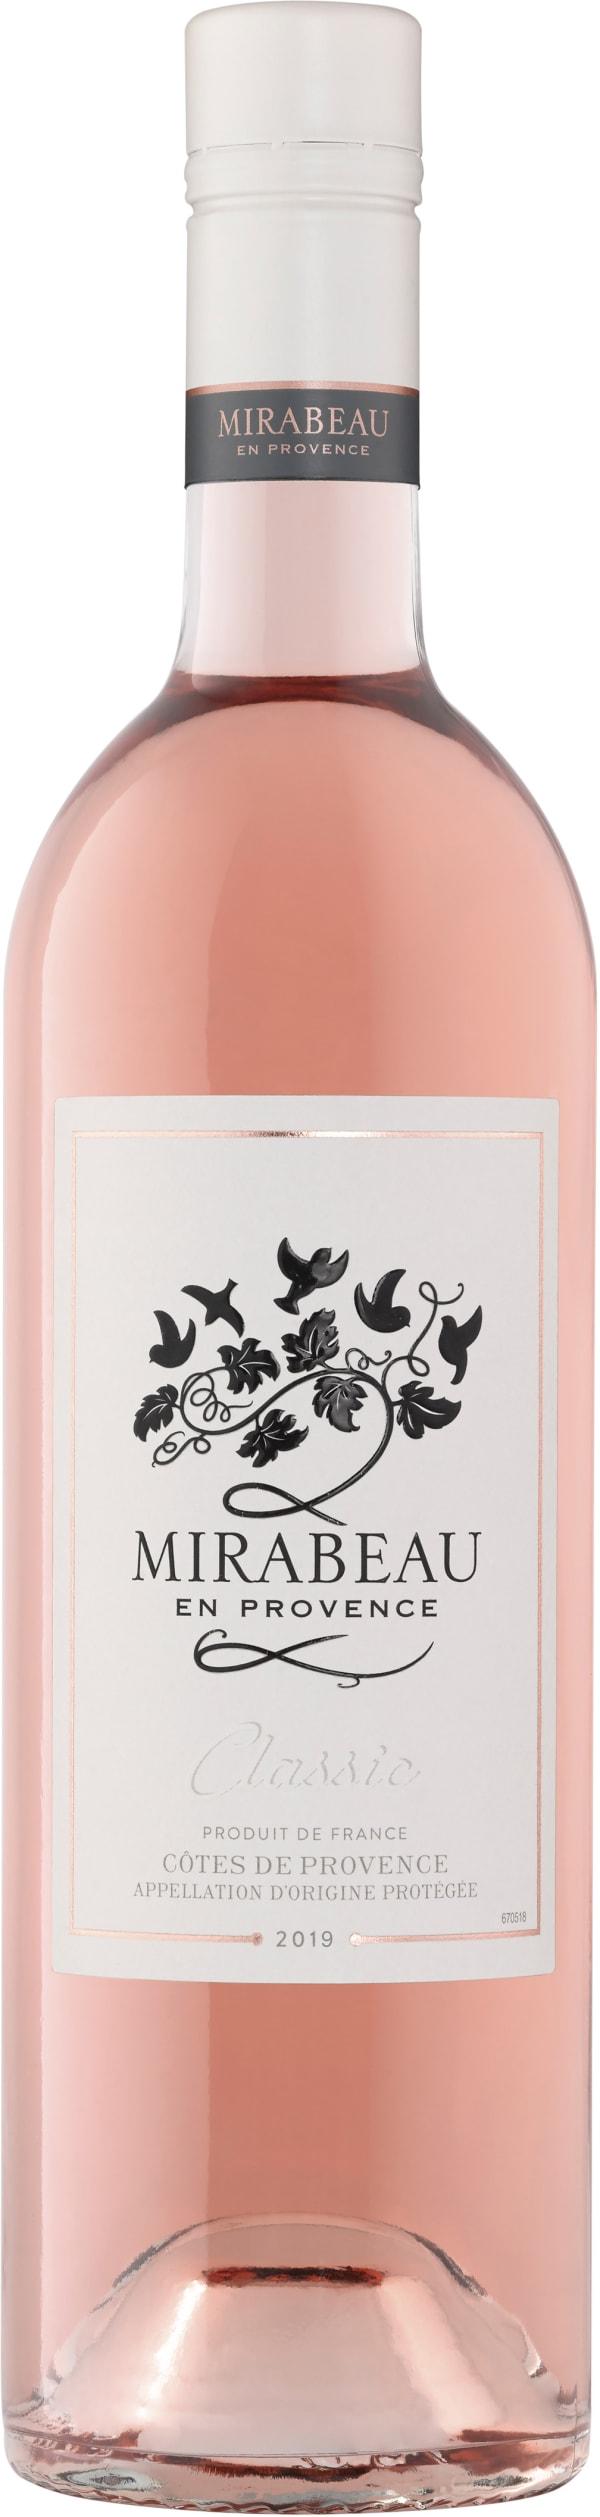 Mirabeau en Provence Rose 2016